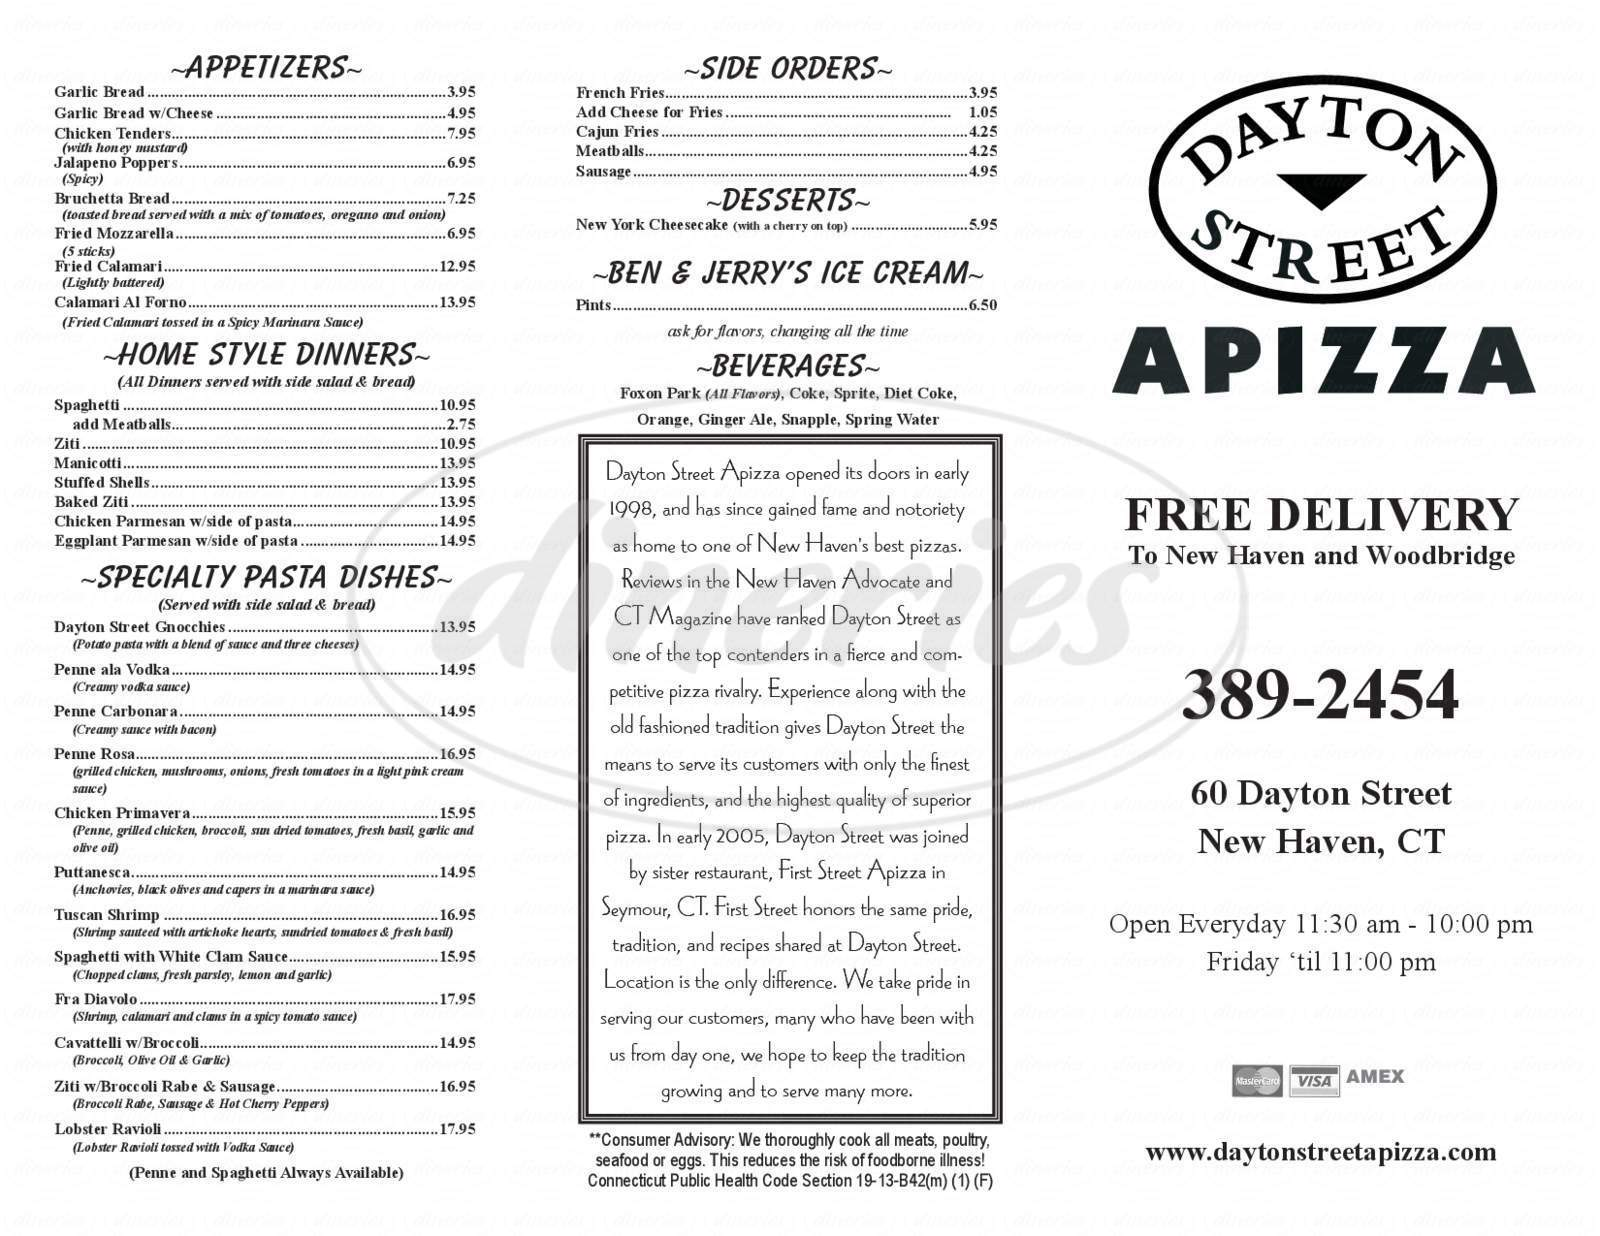 menu for Dayton Street Apizza